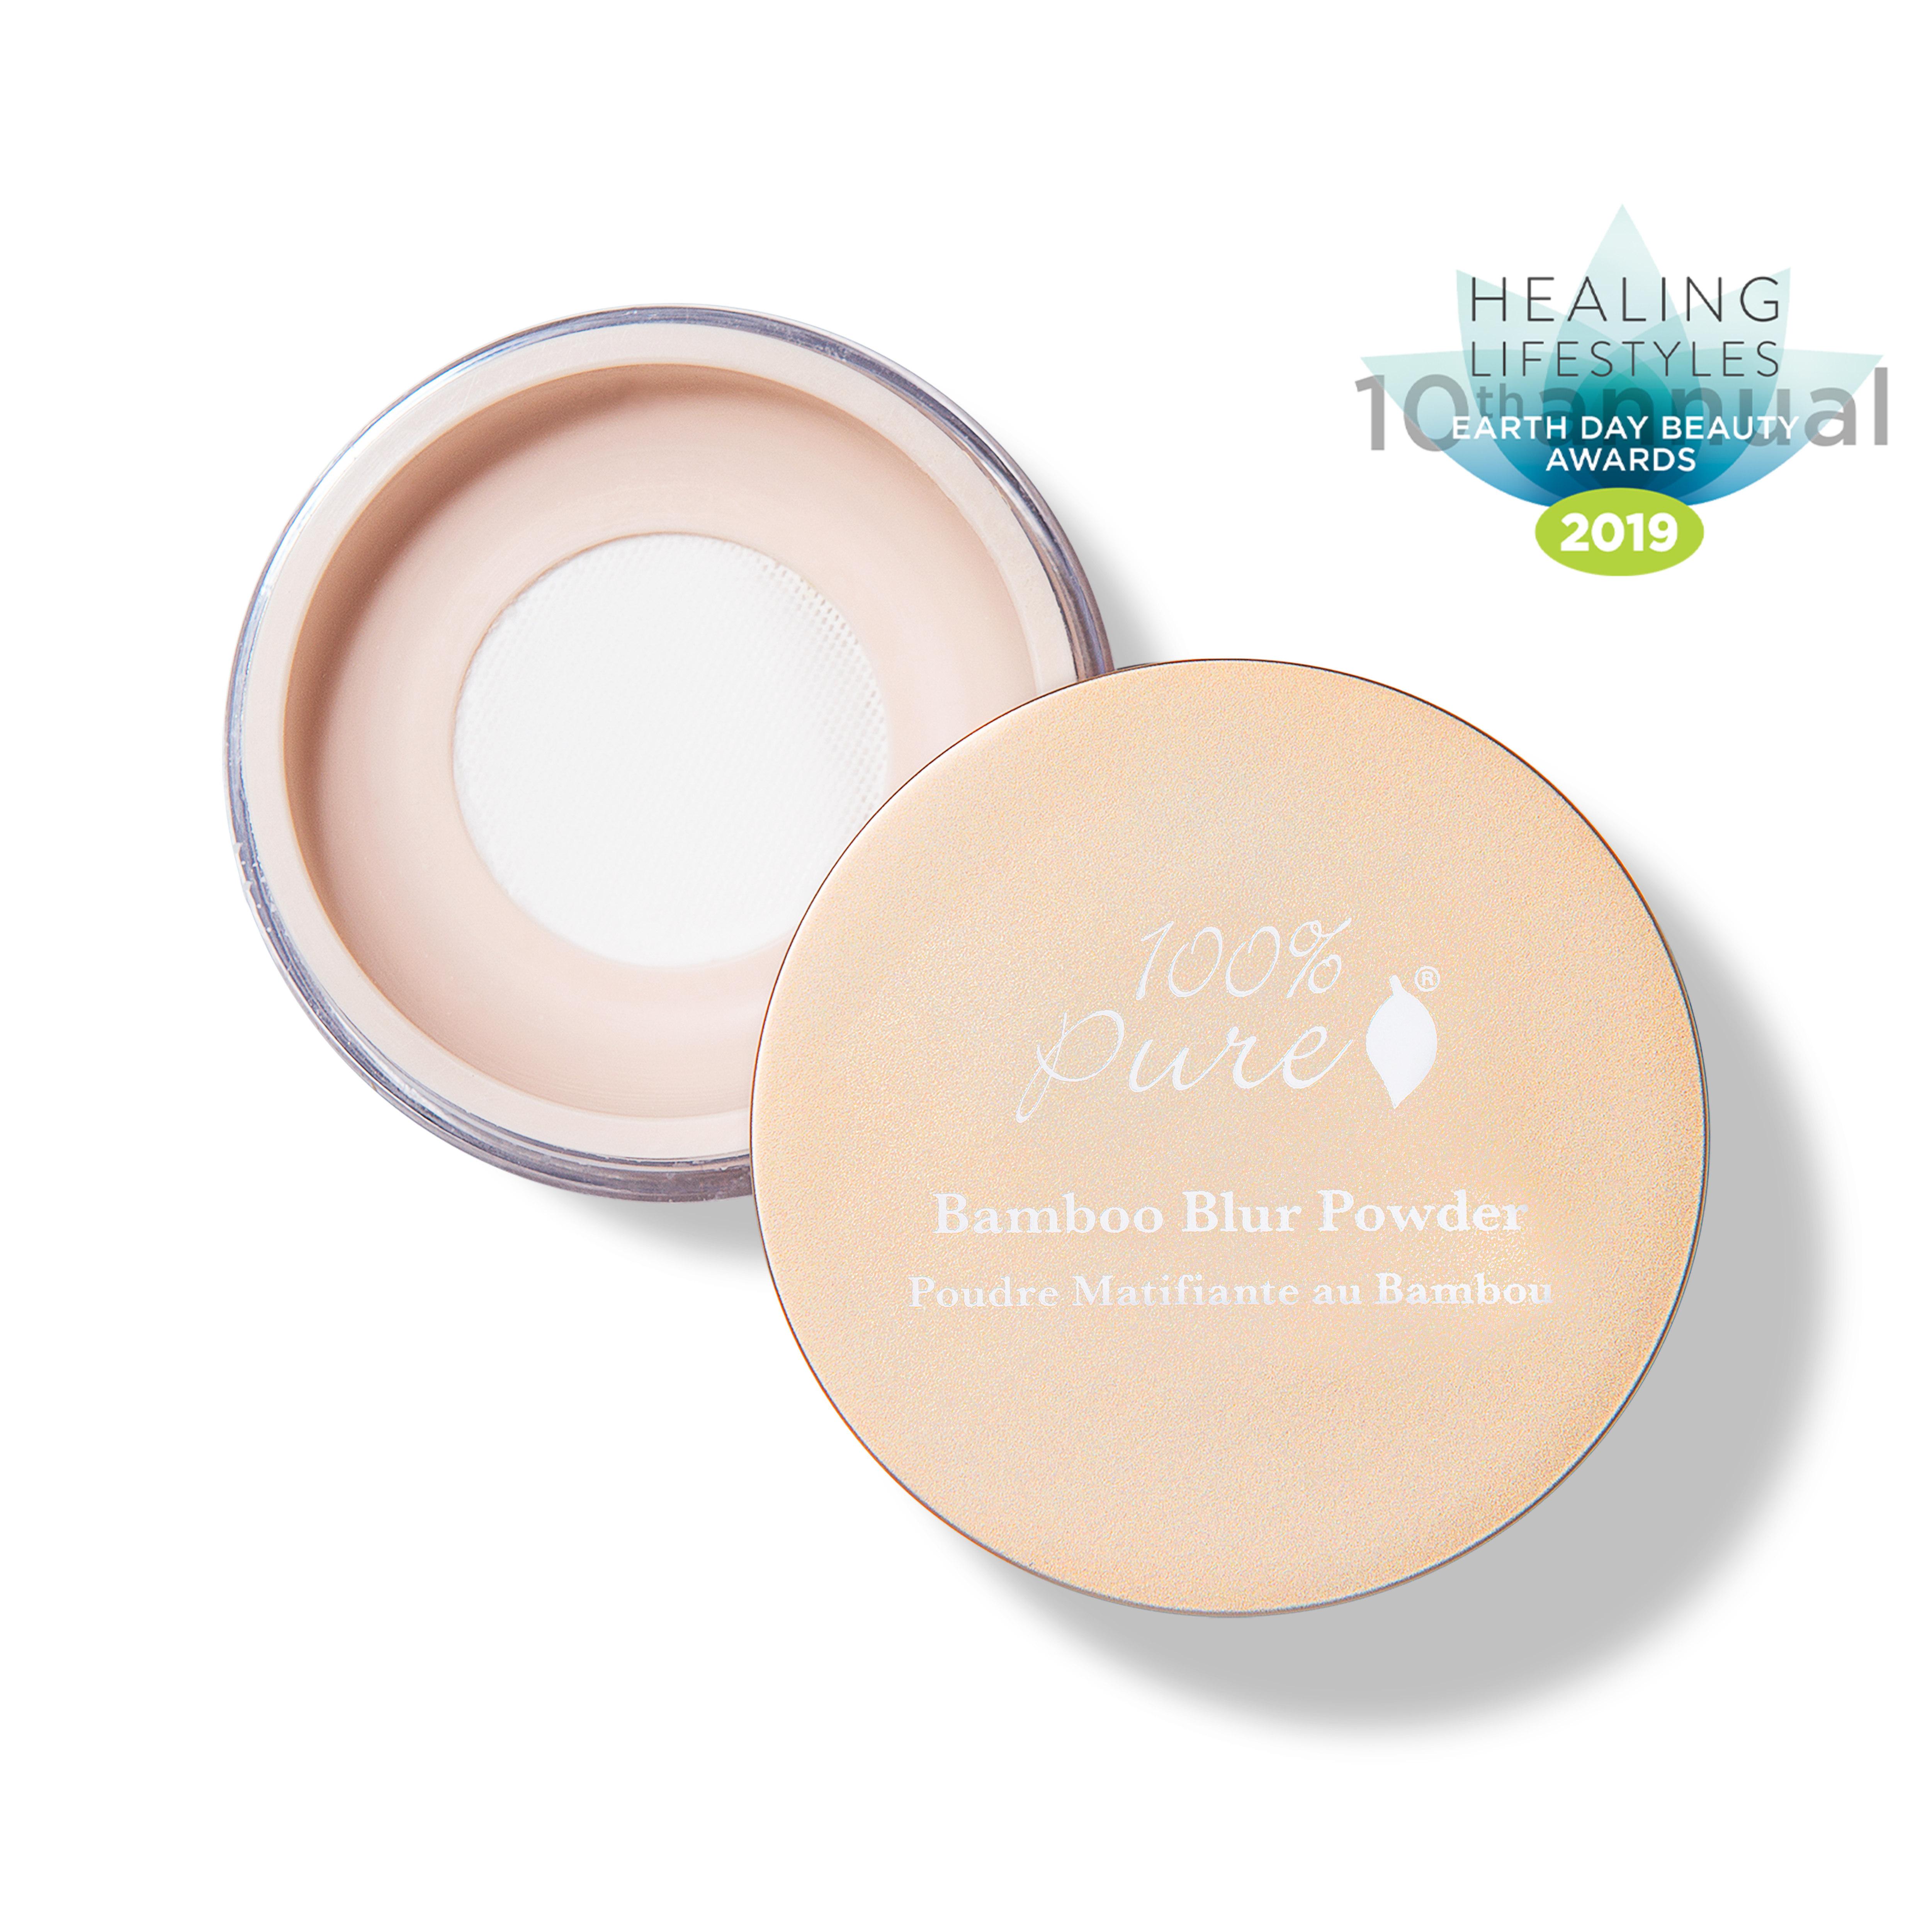 Product Grid - Bamboo Blur Powder